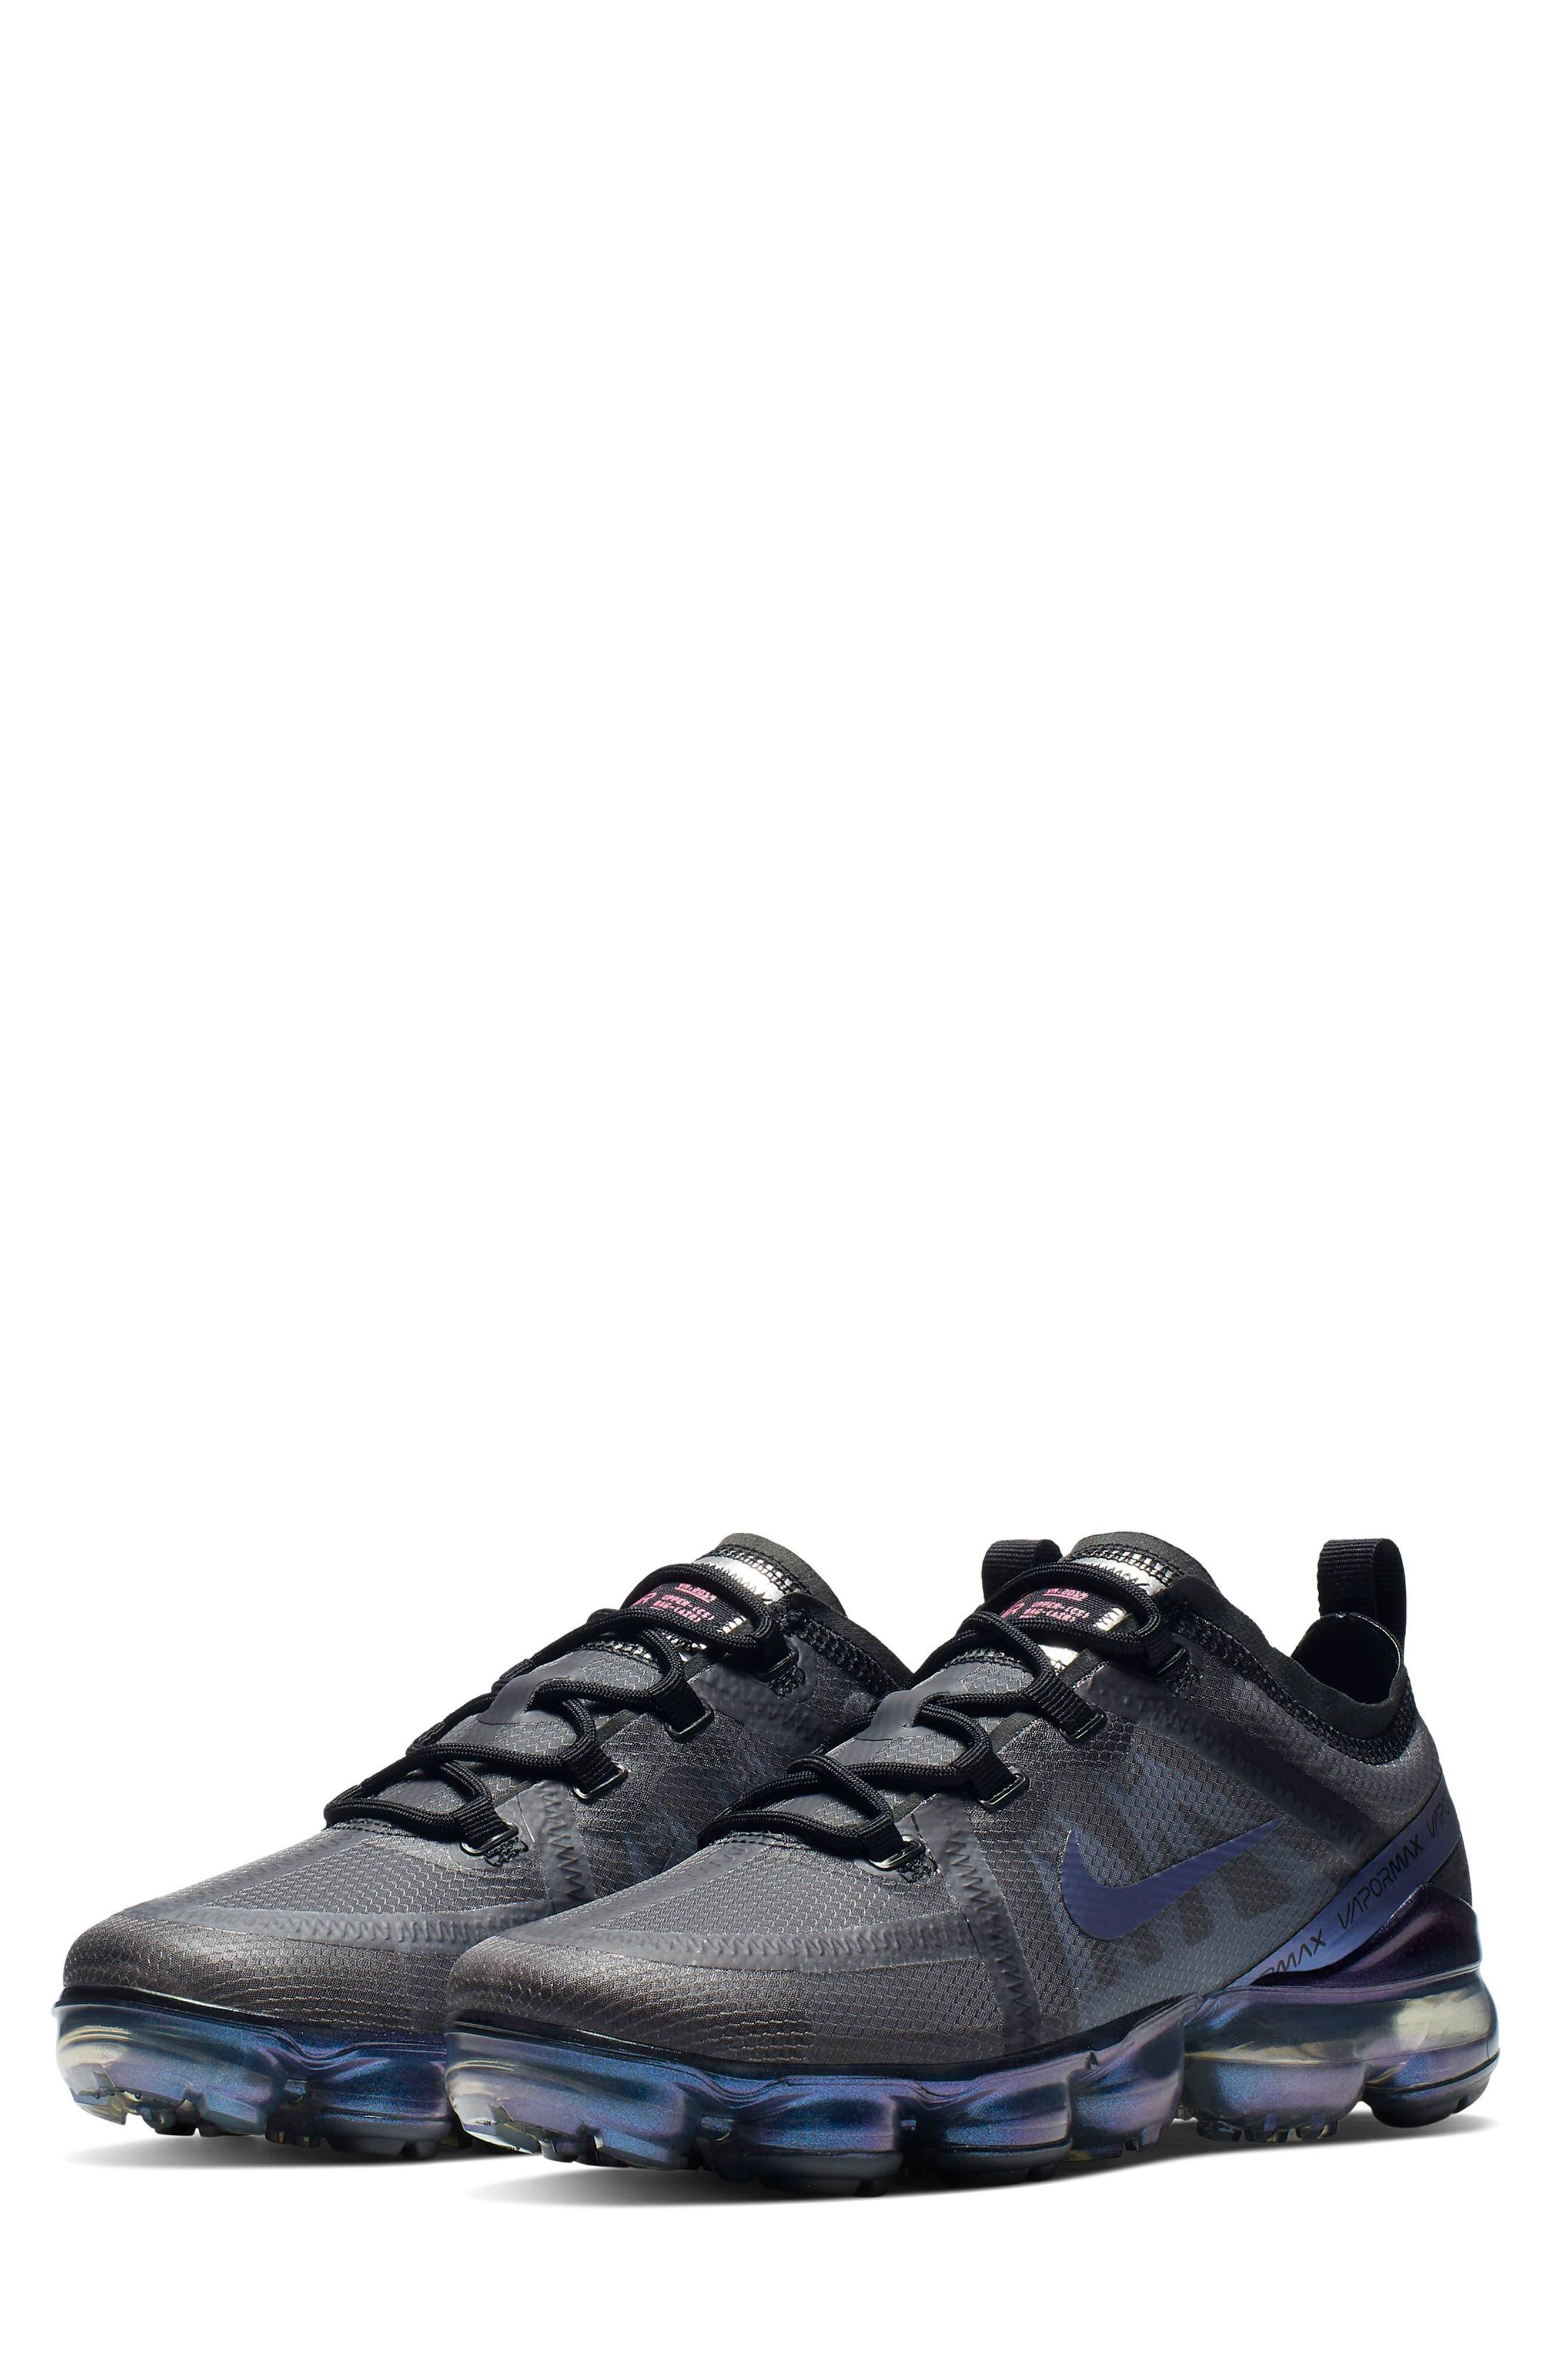 NIKE, Air VaporMax 2019 Running Shoe, Main thumbnail 1, color, BLACK/ MULTI COLOR